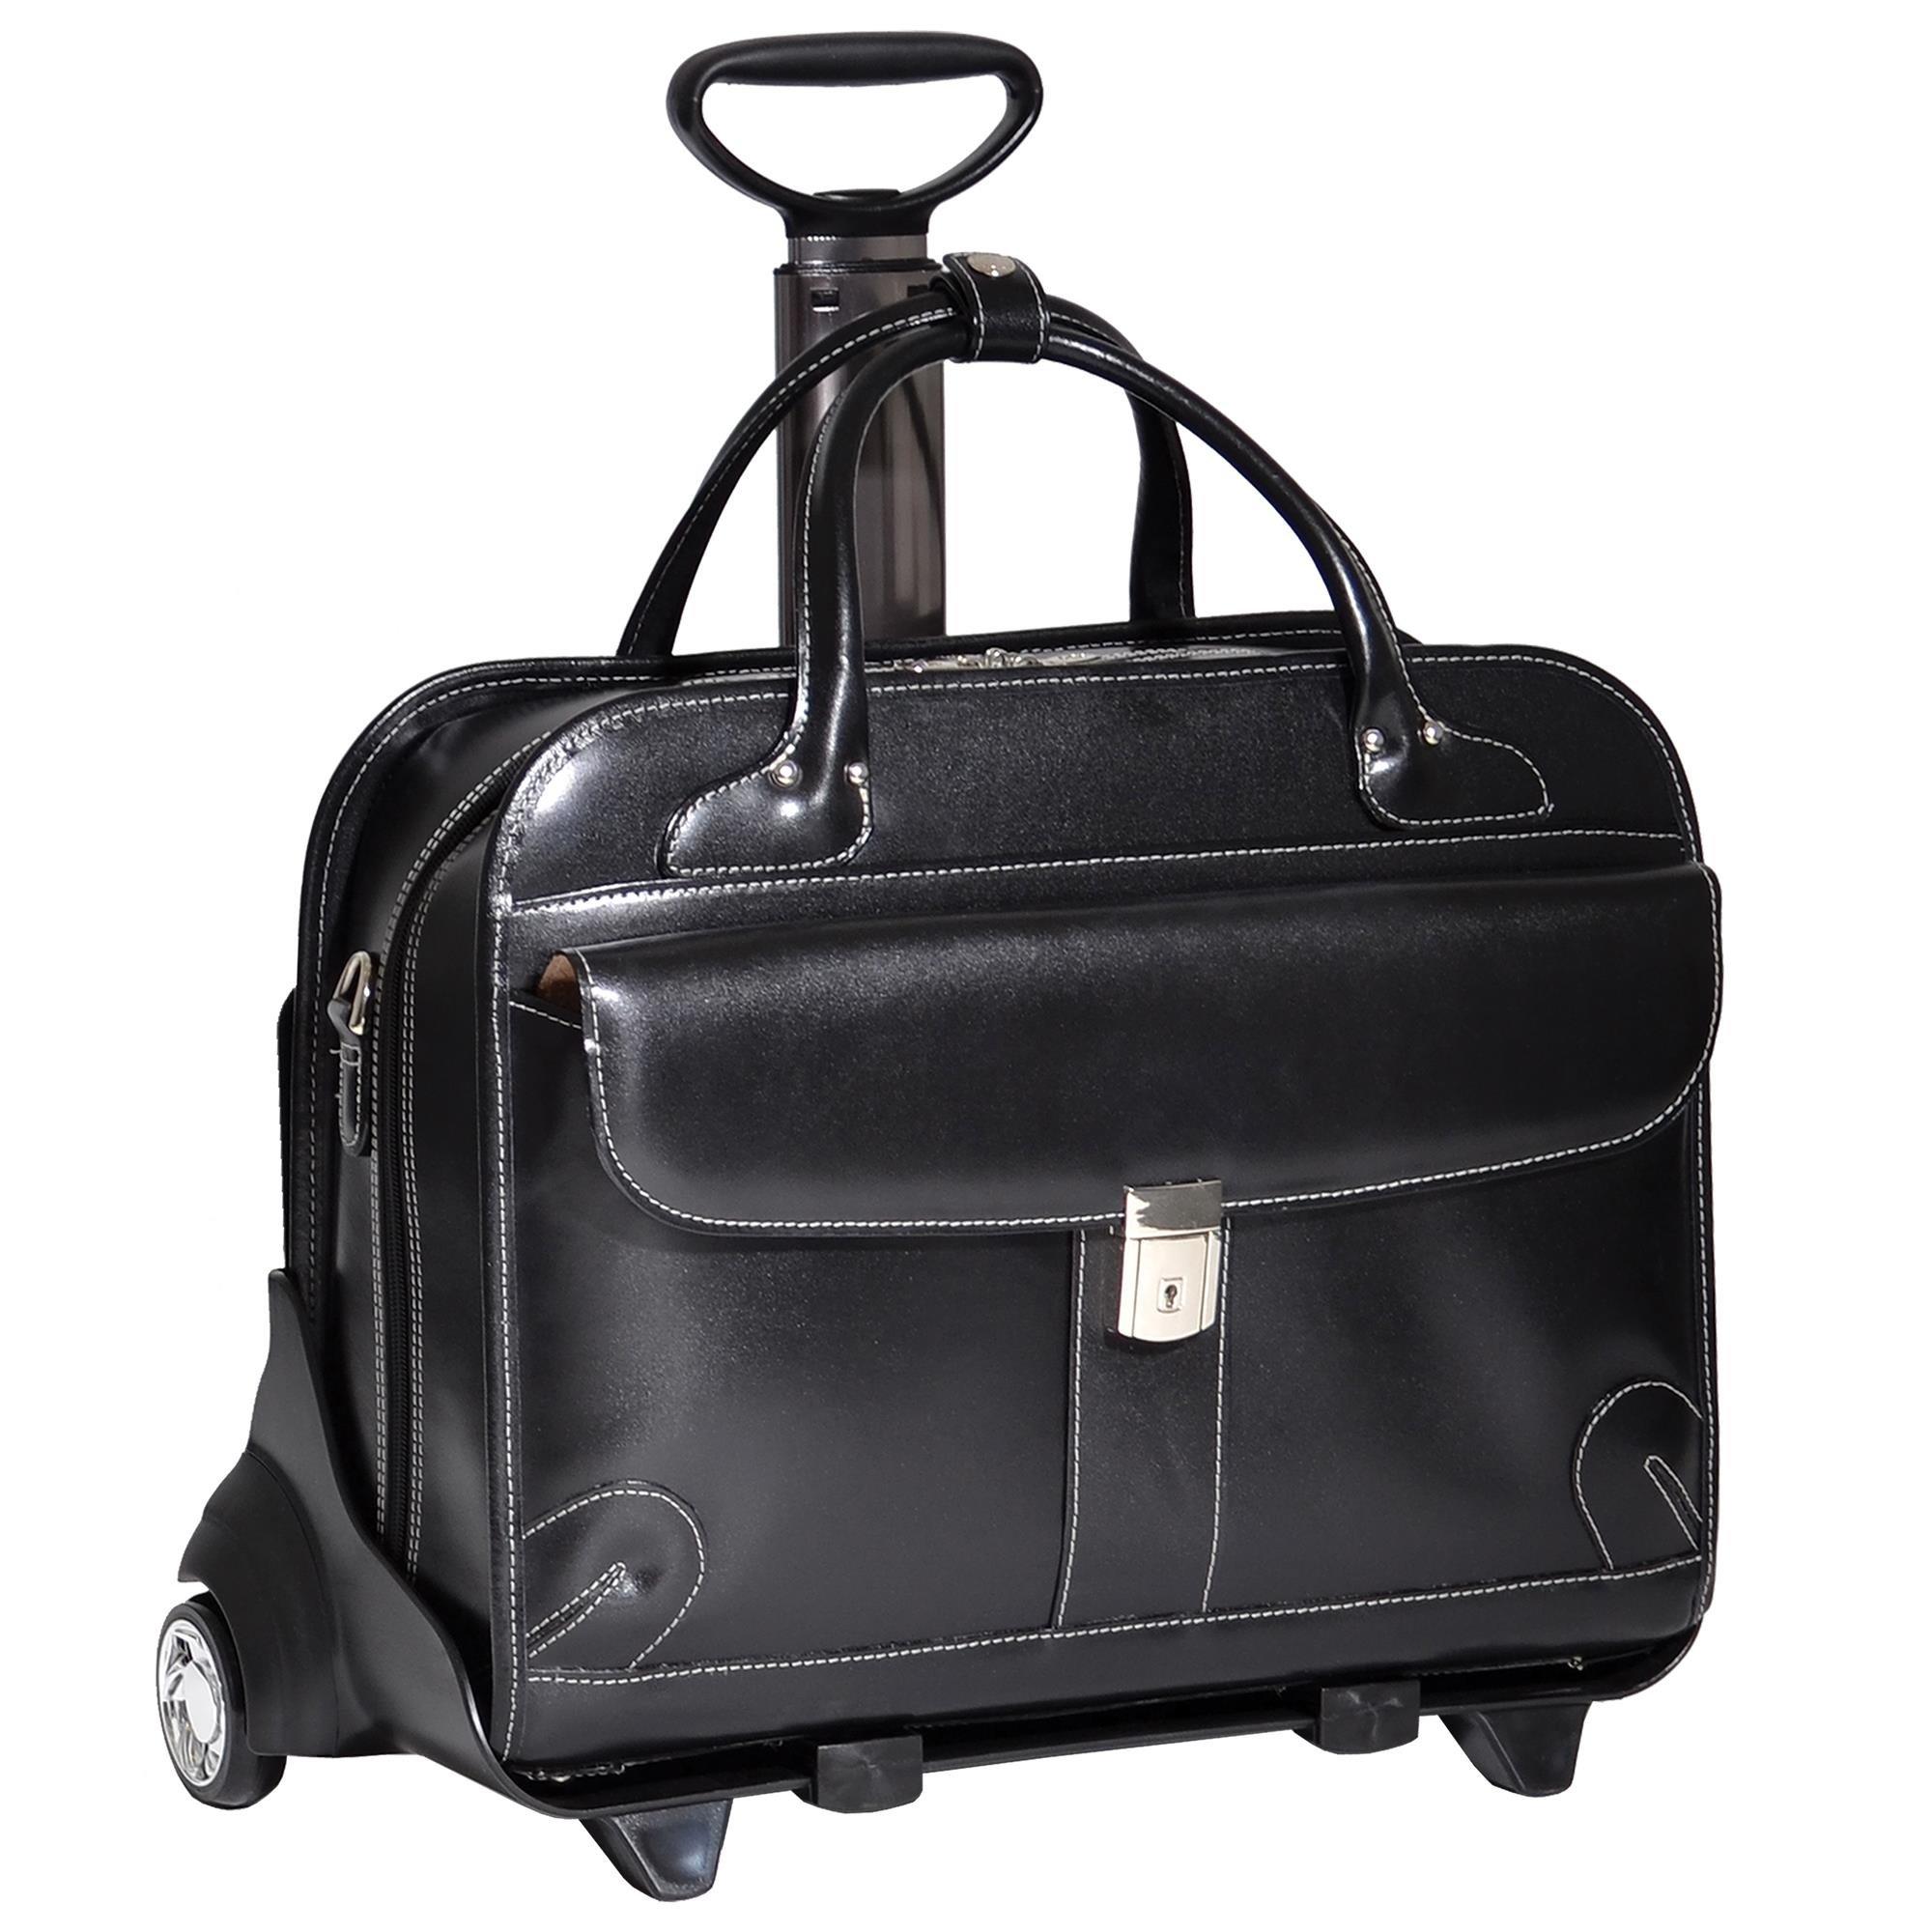 McKleinUSA LAKEWOOD 96615 Black Leather Fly-Through Checkpoint-Friendly Detachable-Wheeled Ladies' Briefcase